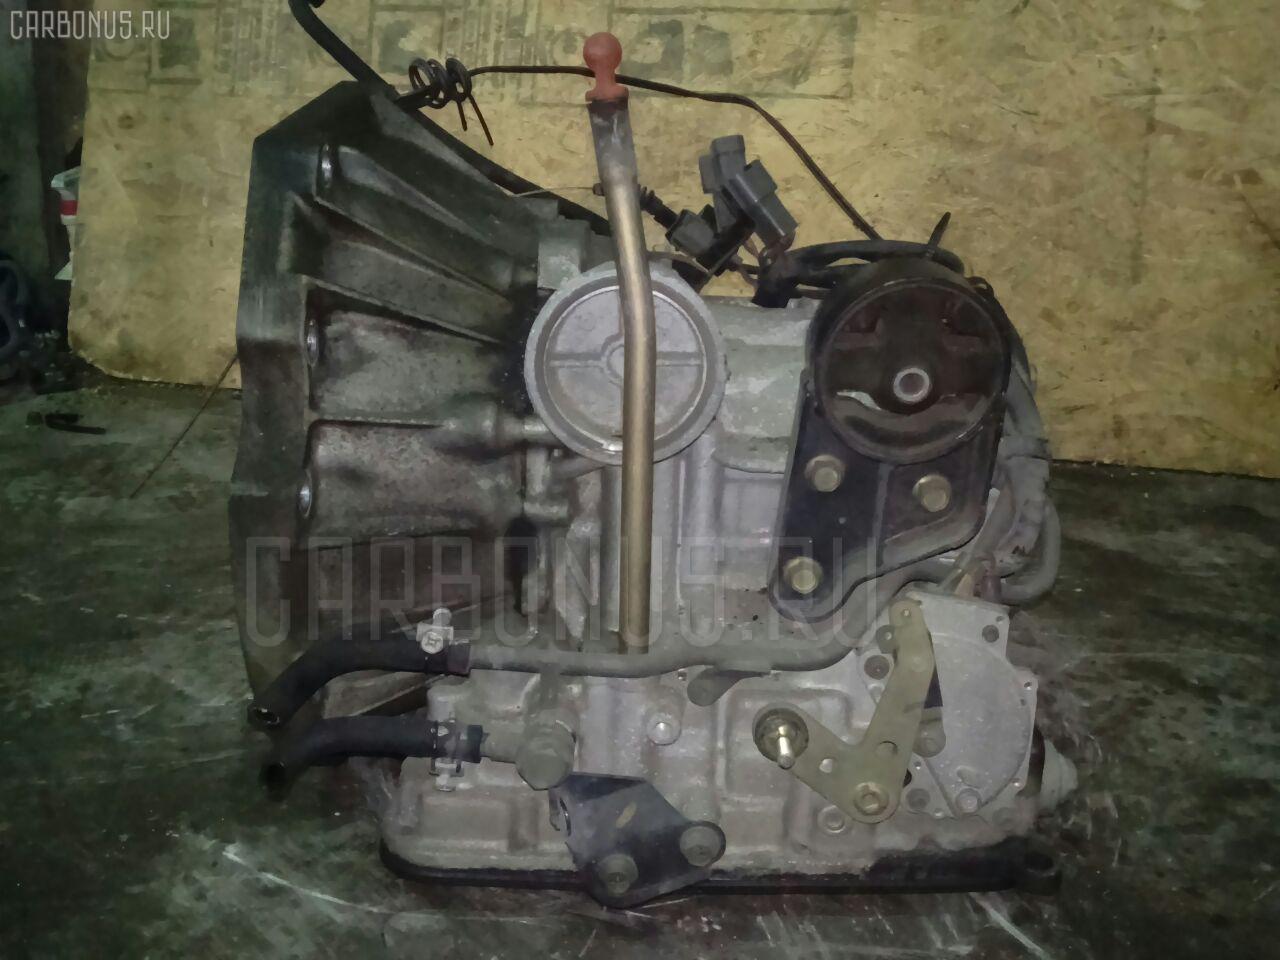 КПП автоматическая NISSAN PRIMERA P10 SR18DI Фото 1